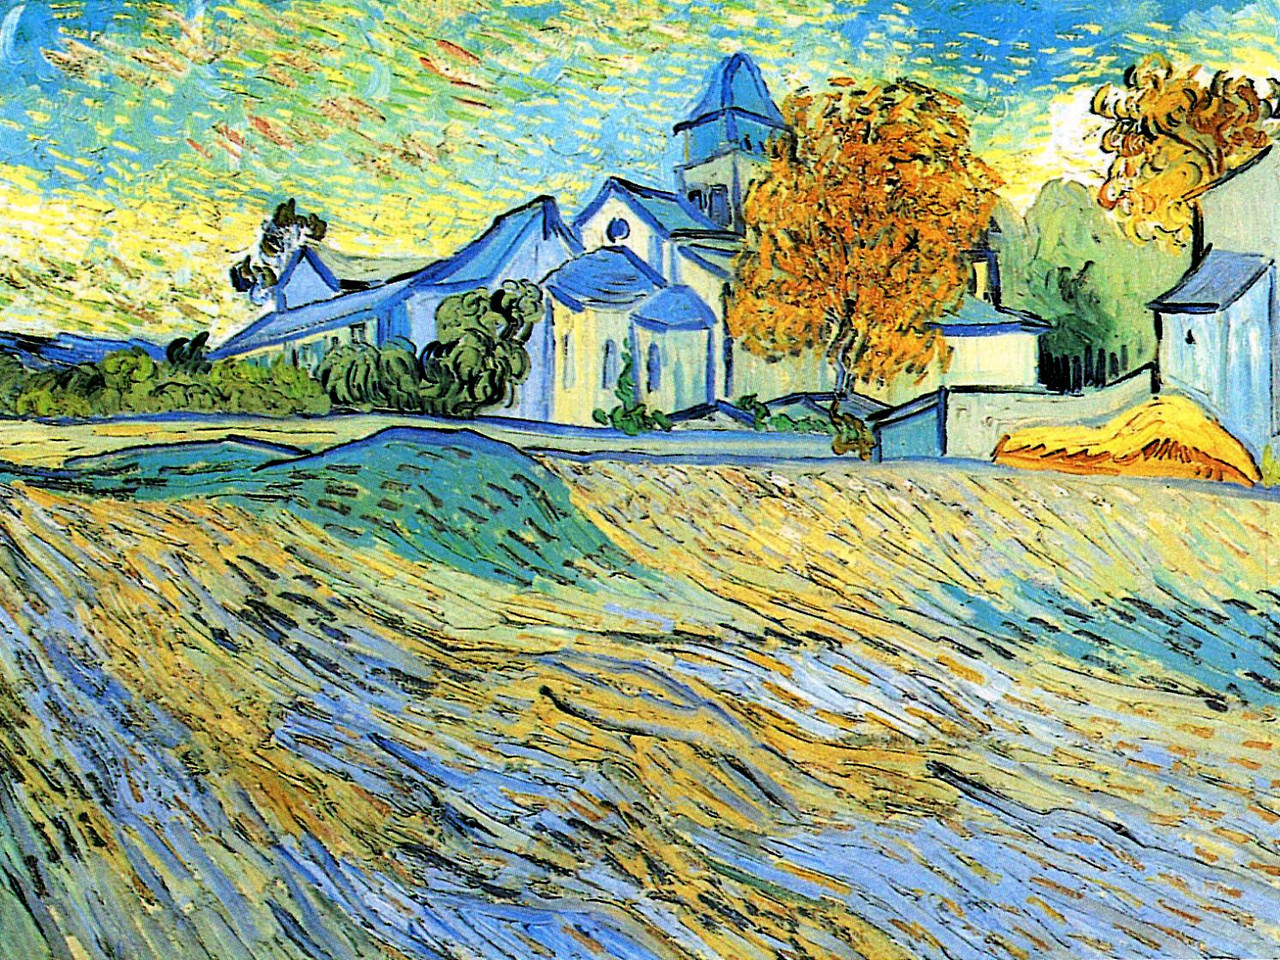 "artist-vangogh:"" View of the Church of Saint-Paul-de-Mausole by Vincent van GoghSize: 44.5x60 cmMedium: oil on canvas"""